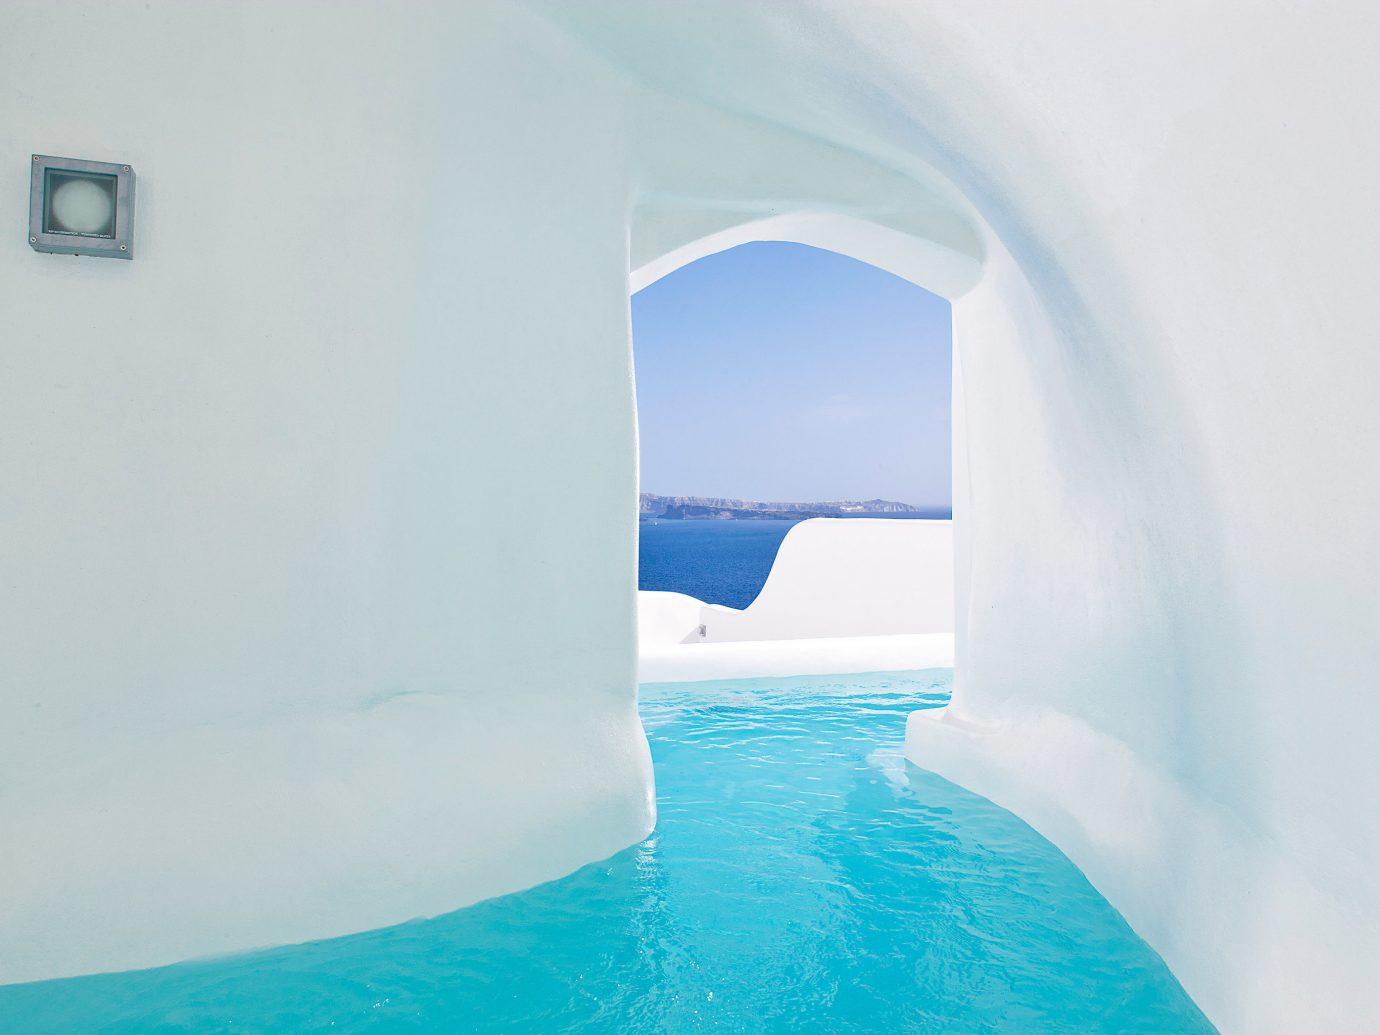 Bedroom Elegant Greece Historic Honeymoon Hot tub/Jacuzzi Hotels Luxury Romance Romantic Santorini Waterfront water blue swimming pool ice hotel